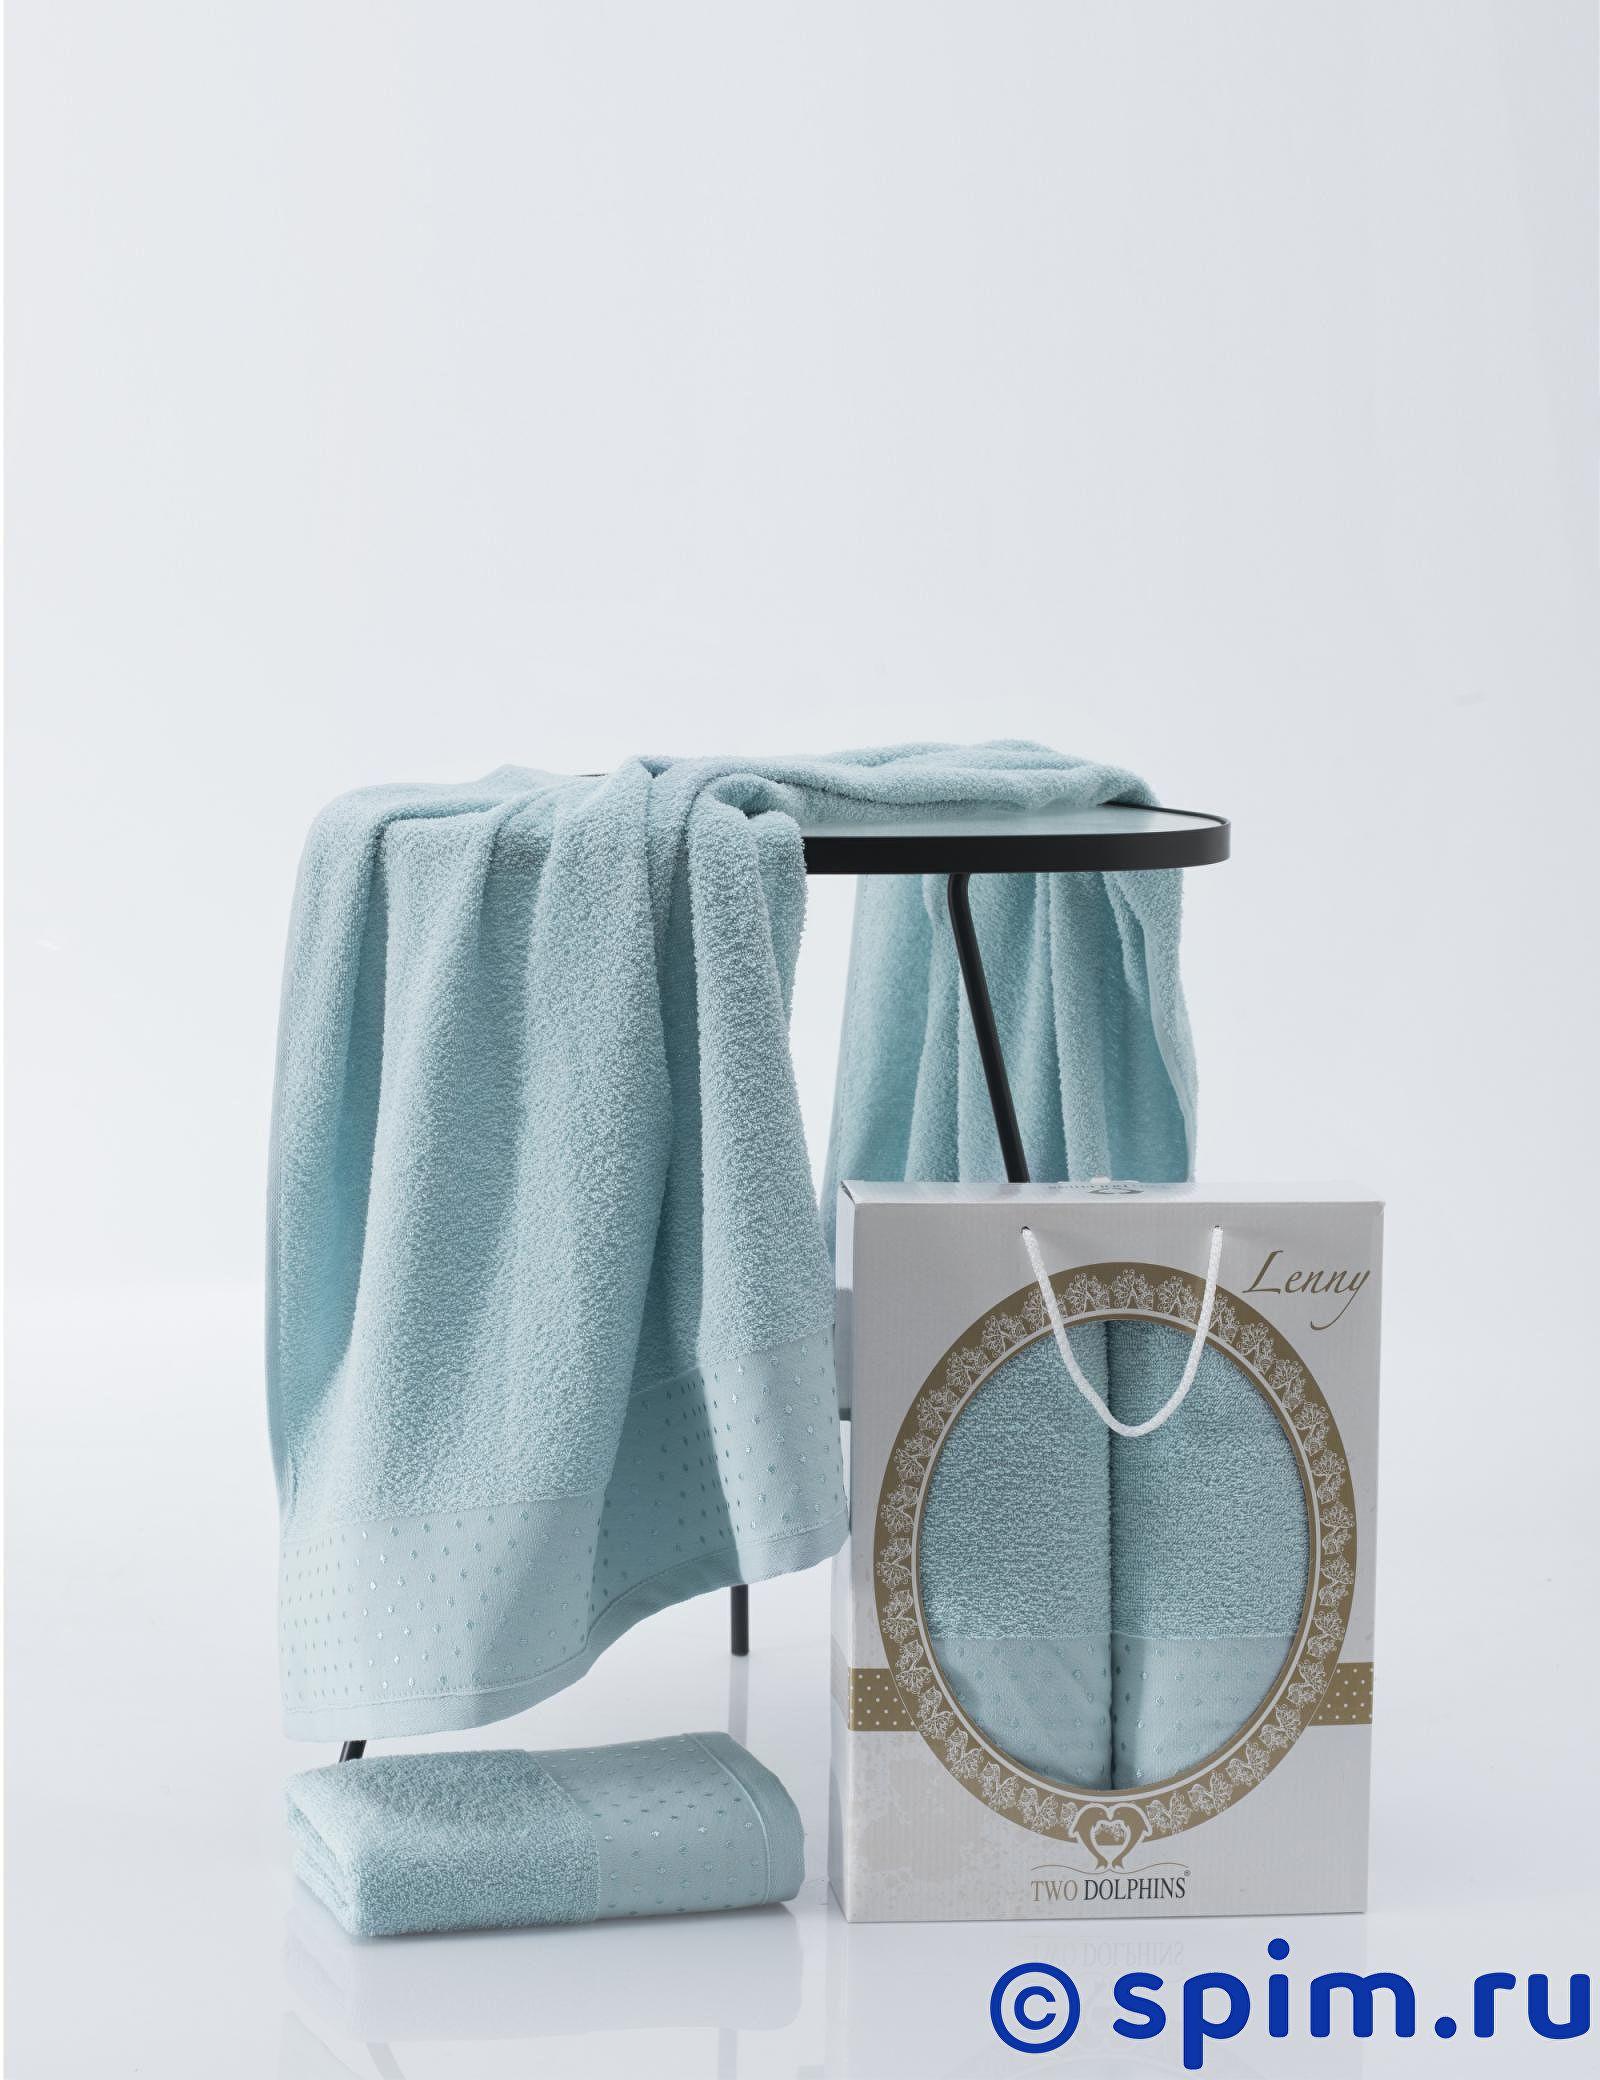 Комплект из 2-х полотенец Two Dolphins Lenny комбинация из сатина lenny